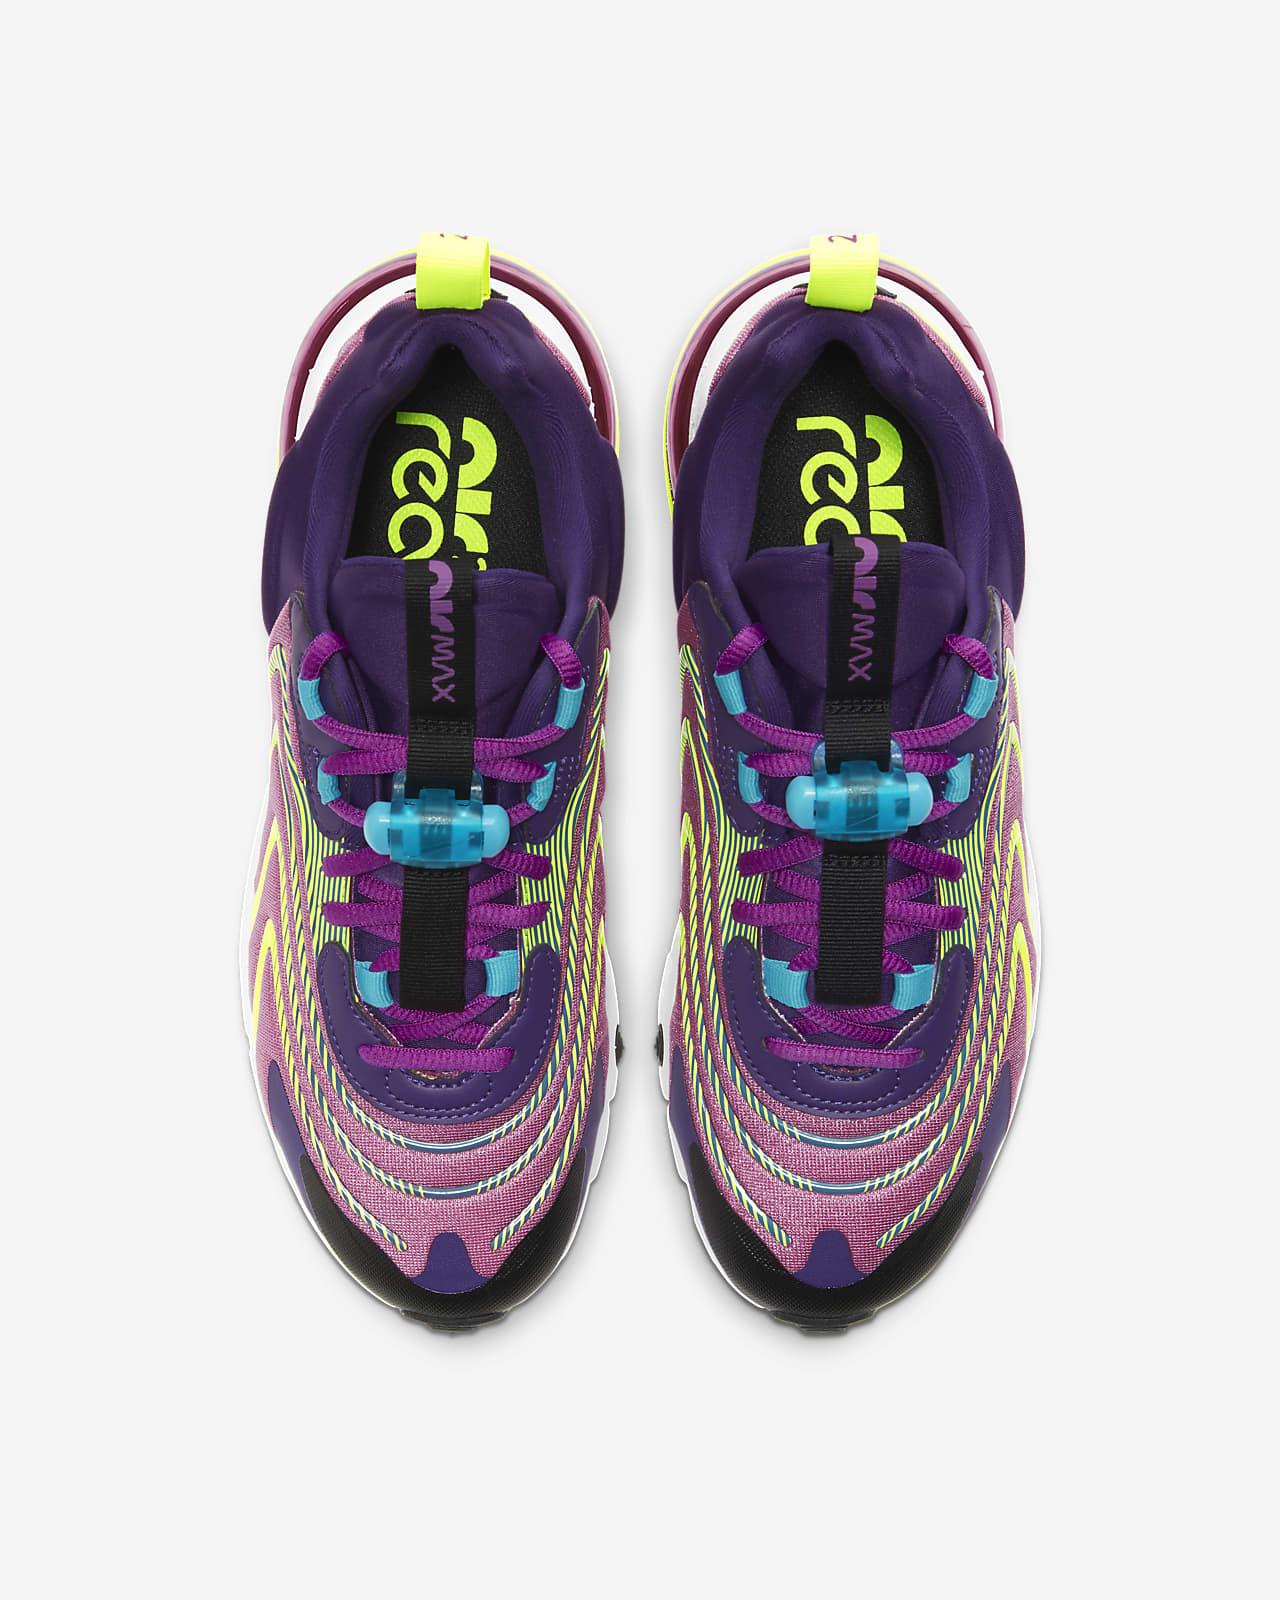 Chaussure Nike Air Max 270 React ENG pour Femme